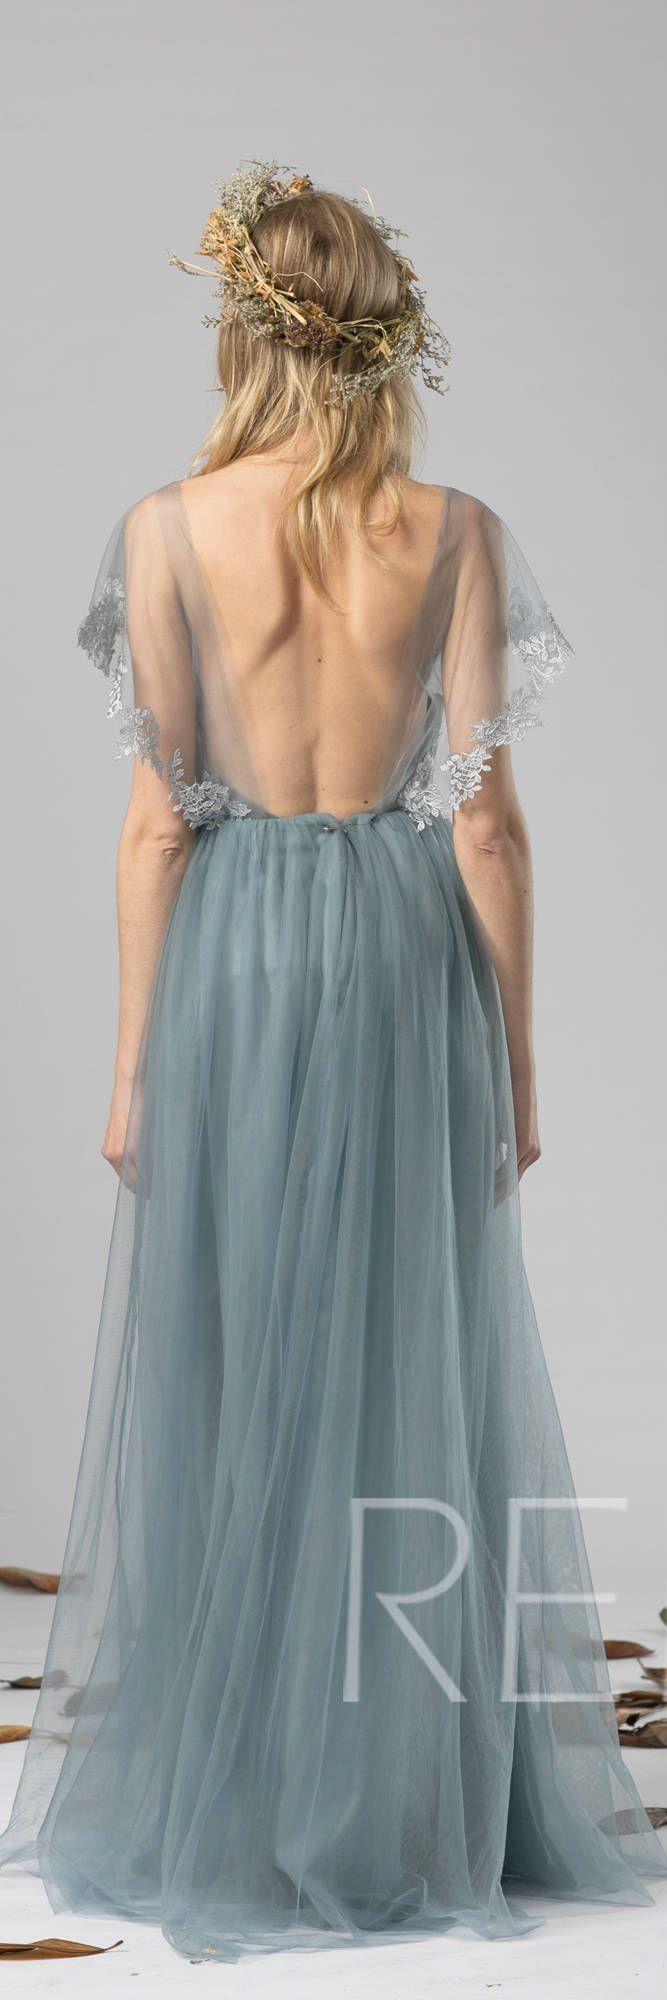 Bridesmaid Dress Dusty Blue Tulle Dress Wedding Dress,Lace Ruffle Sleeve Party Dress,Round Neck Maxi Dress,Open Back Evening Dress(LS408) #weddingdress